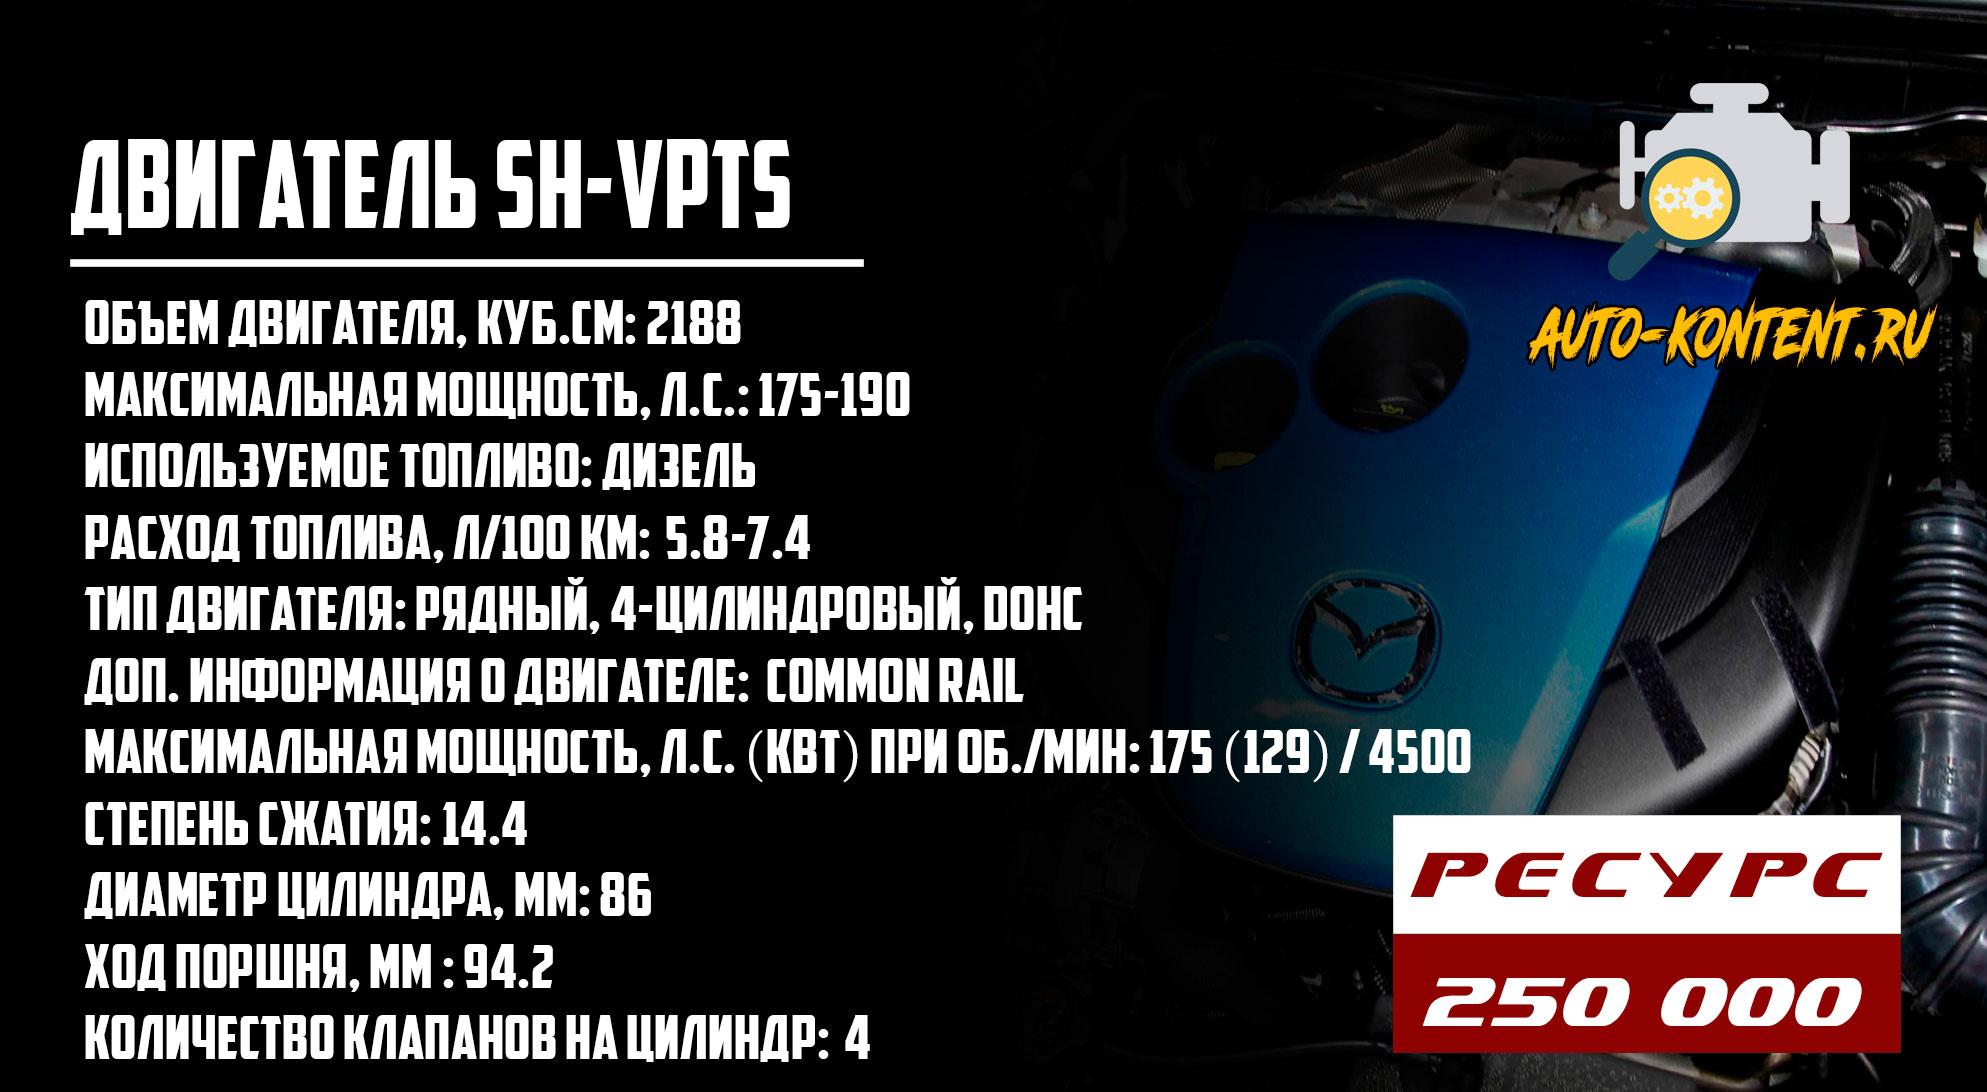 SH-VPTS